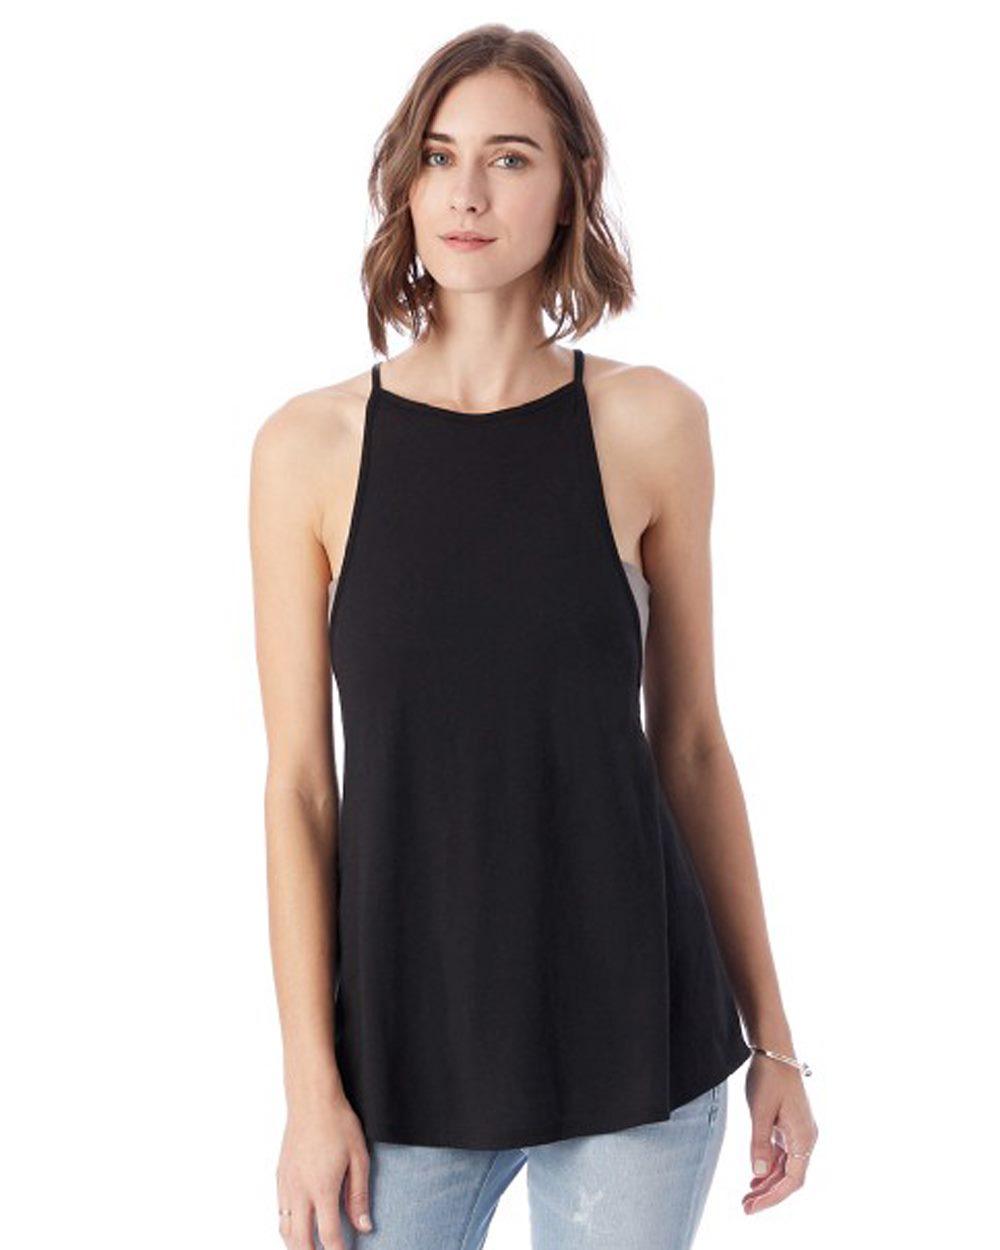 Alternative - Women's 50/50 VIP Tank Top blue dot apparel